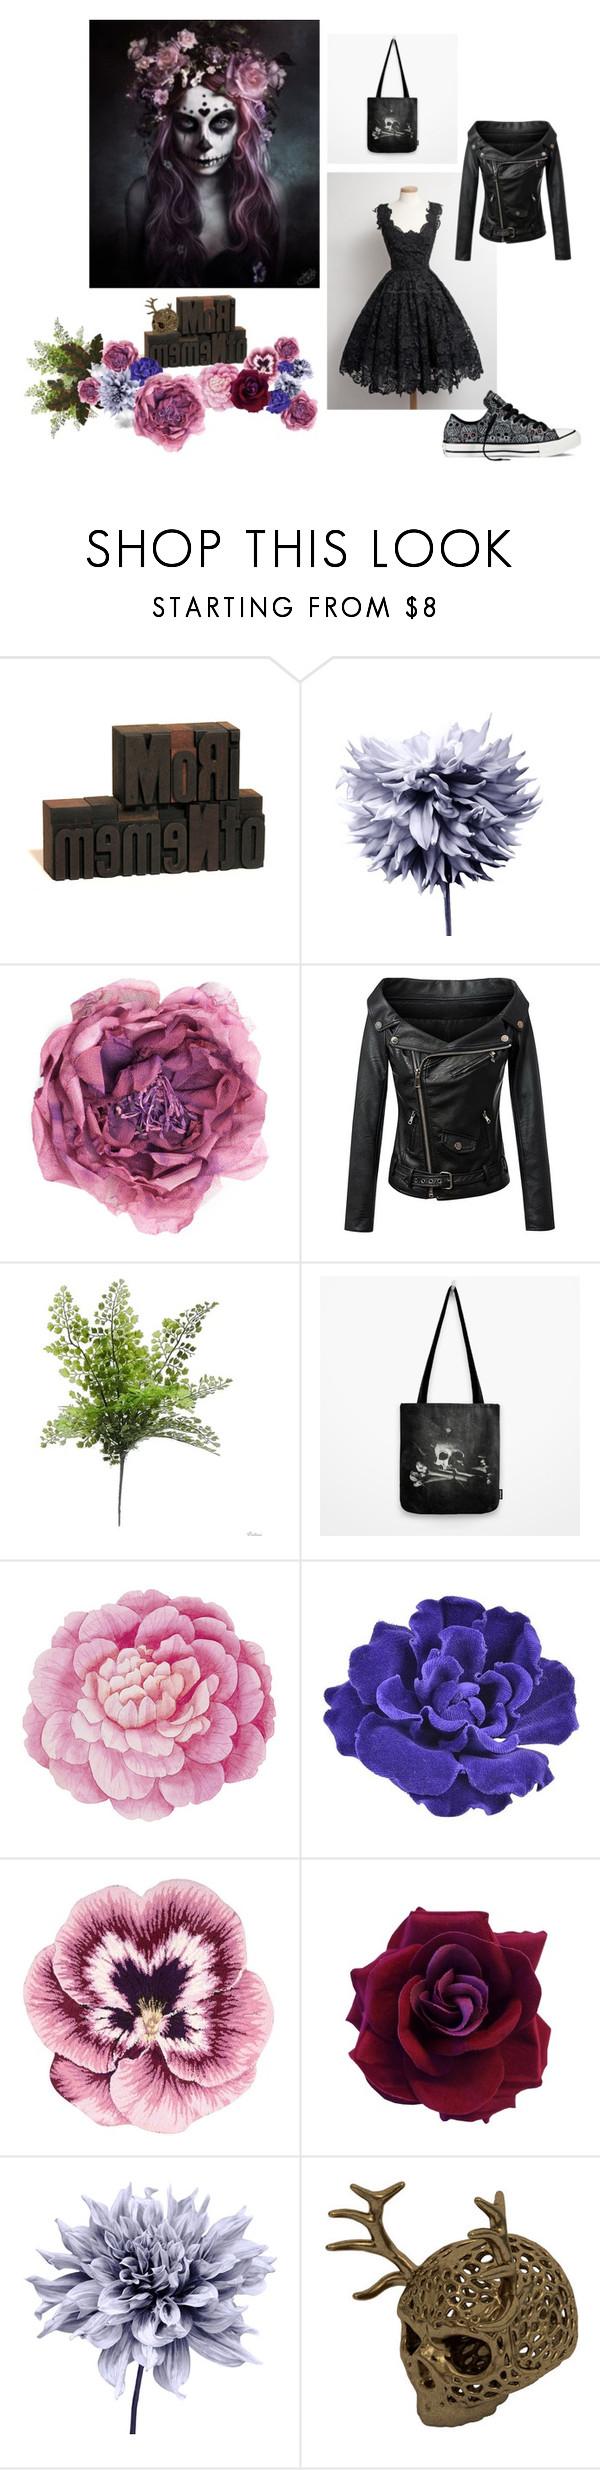 """Memento Mori"" by vegetarian-wolf ❤ liked on Polyvore featuring Art Addiction, Gucci, Chicnova Fashion, WALL, Converse, Ballard Designs, Chanel, Nourison and backtoskull"